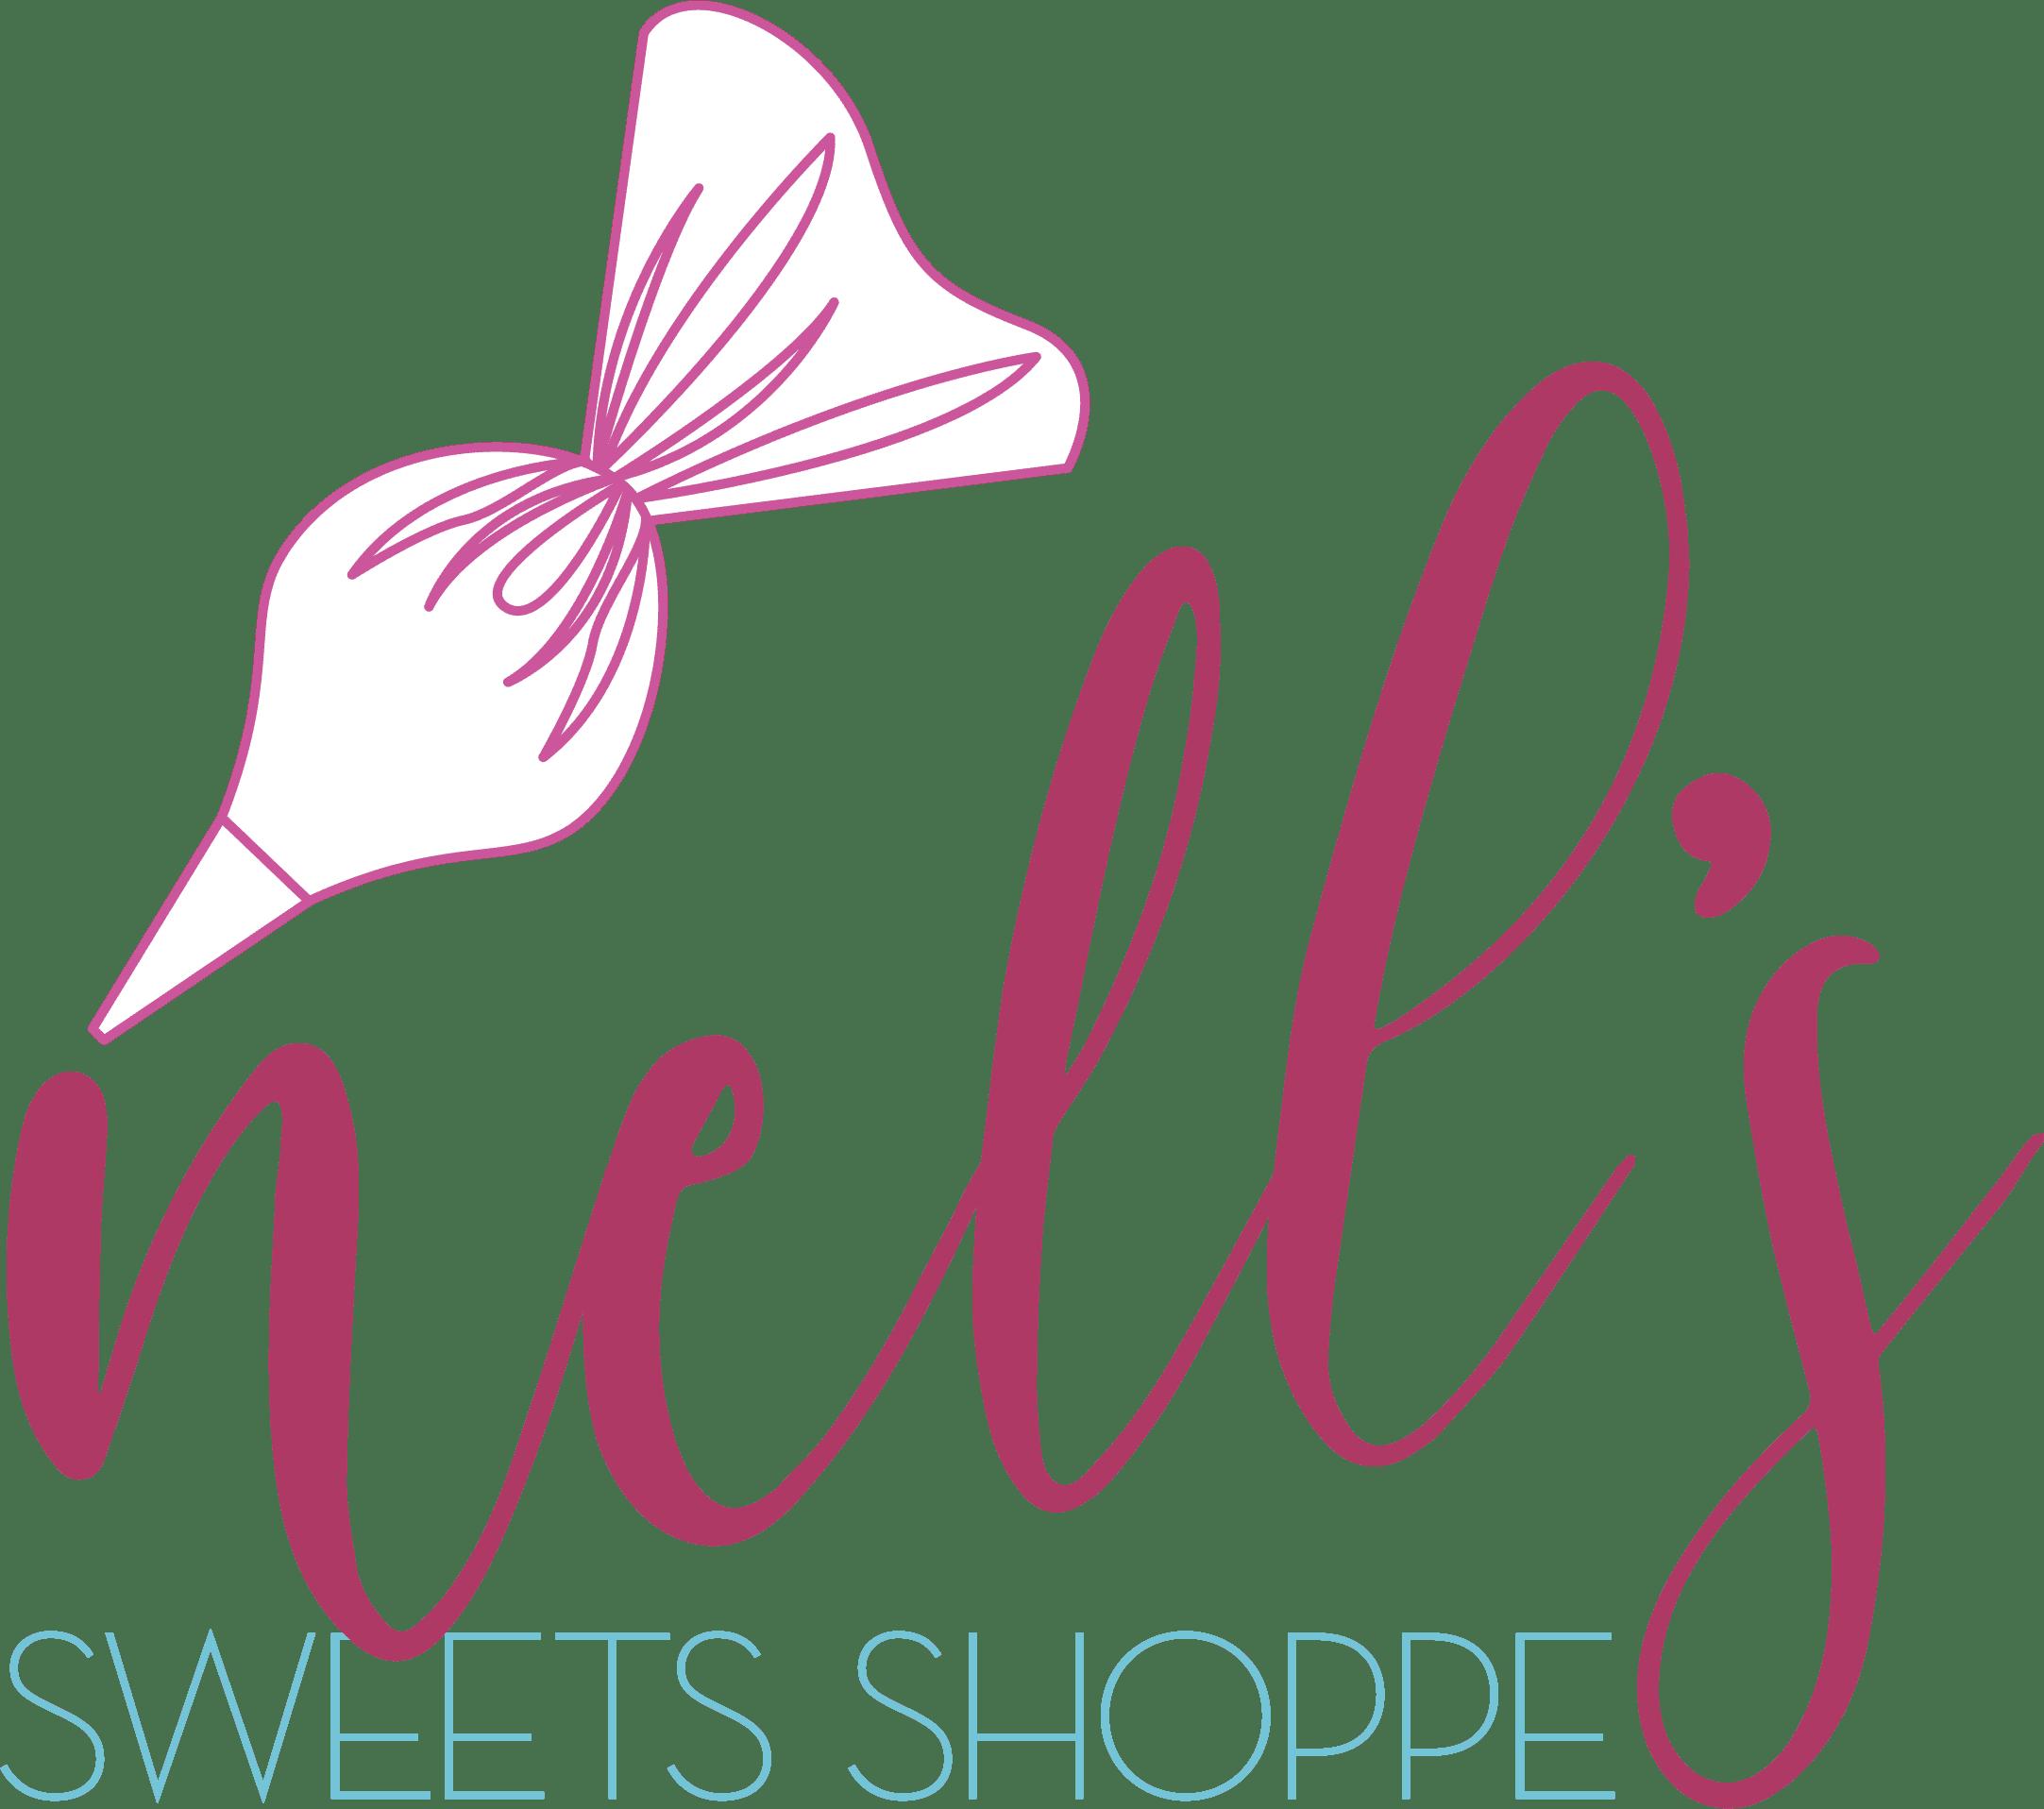 Nell's Sweet Shoppe